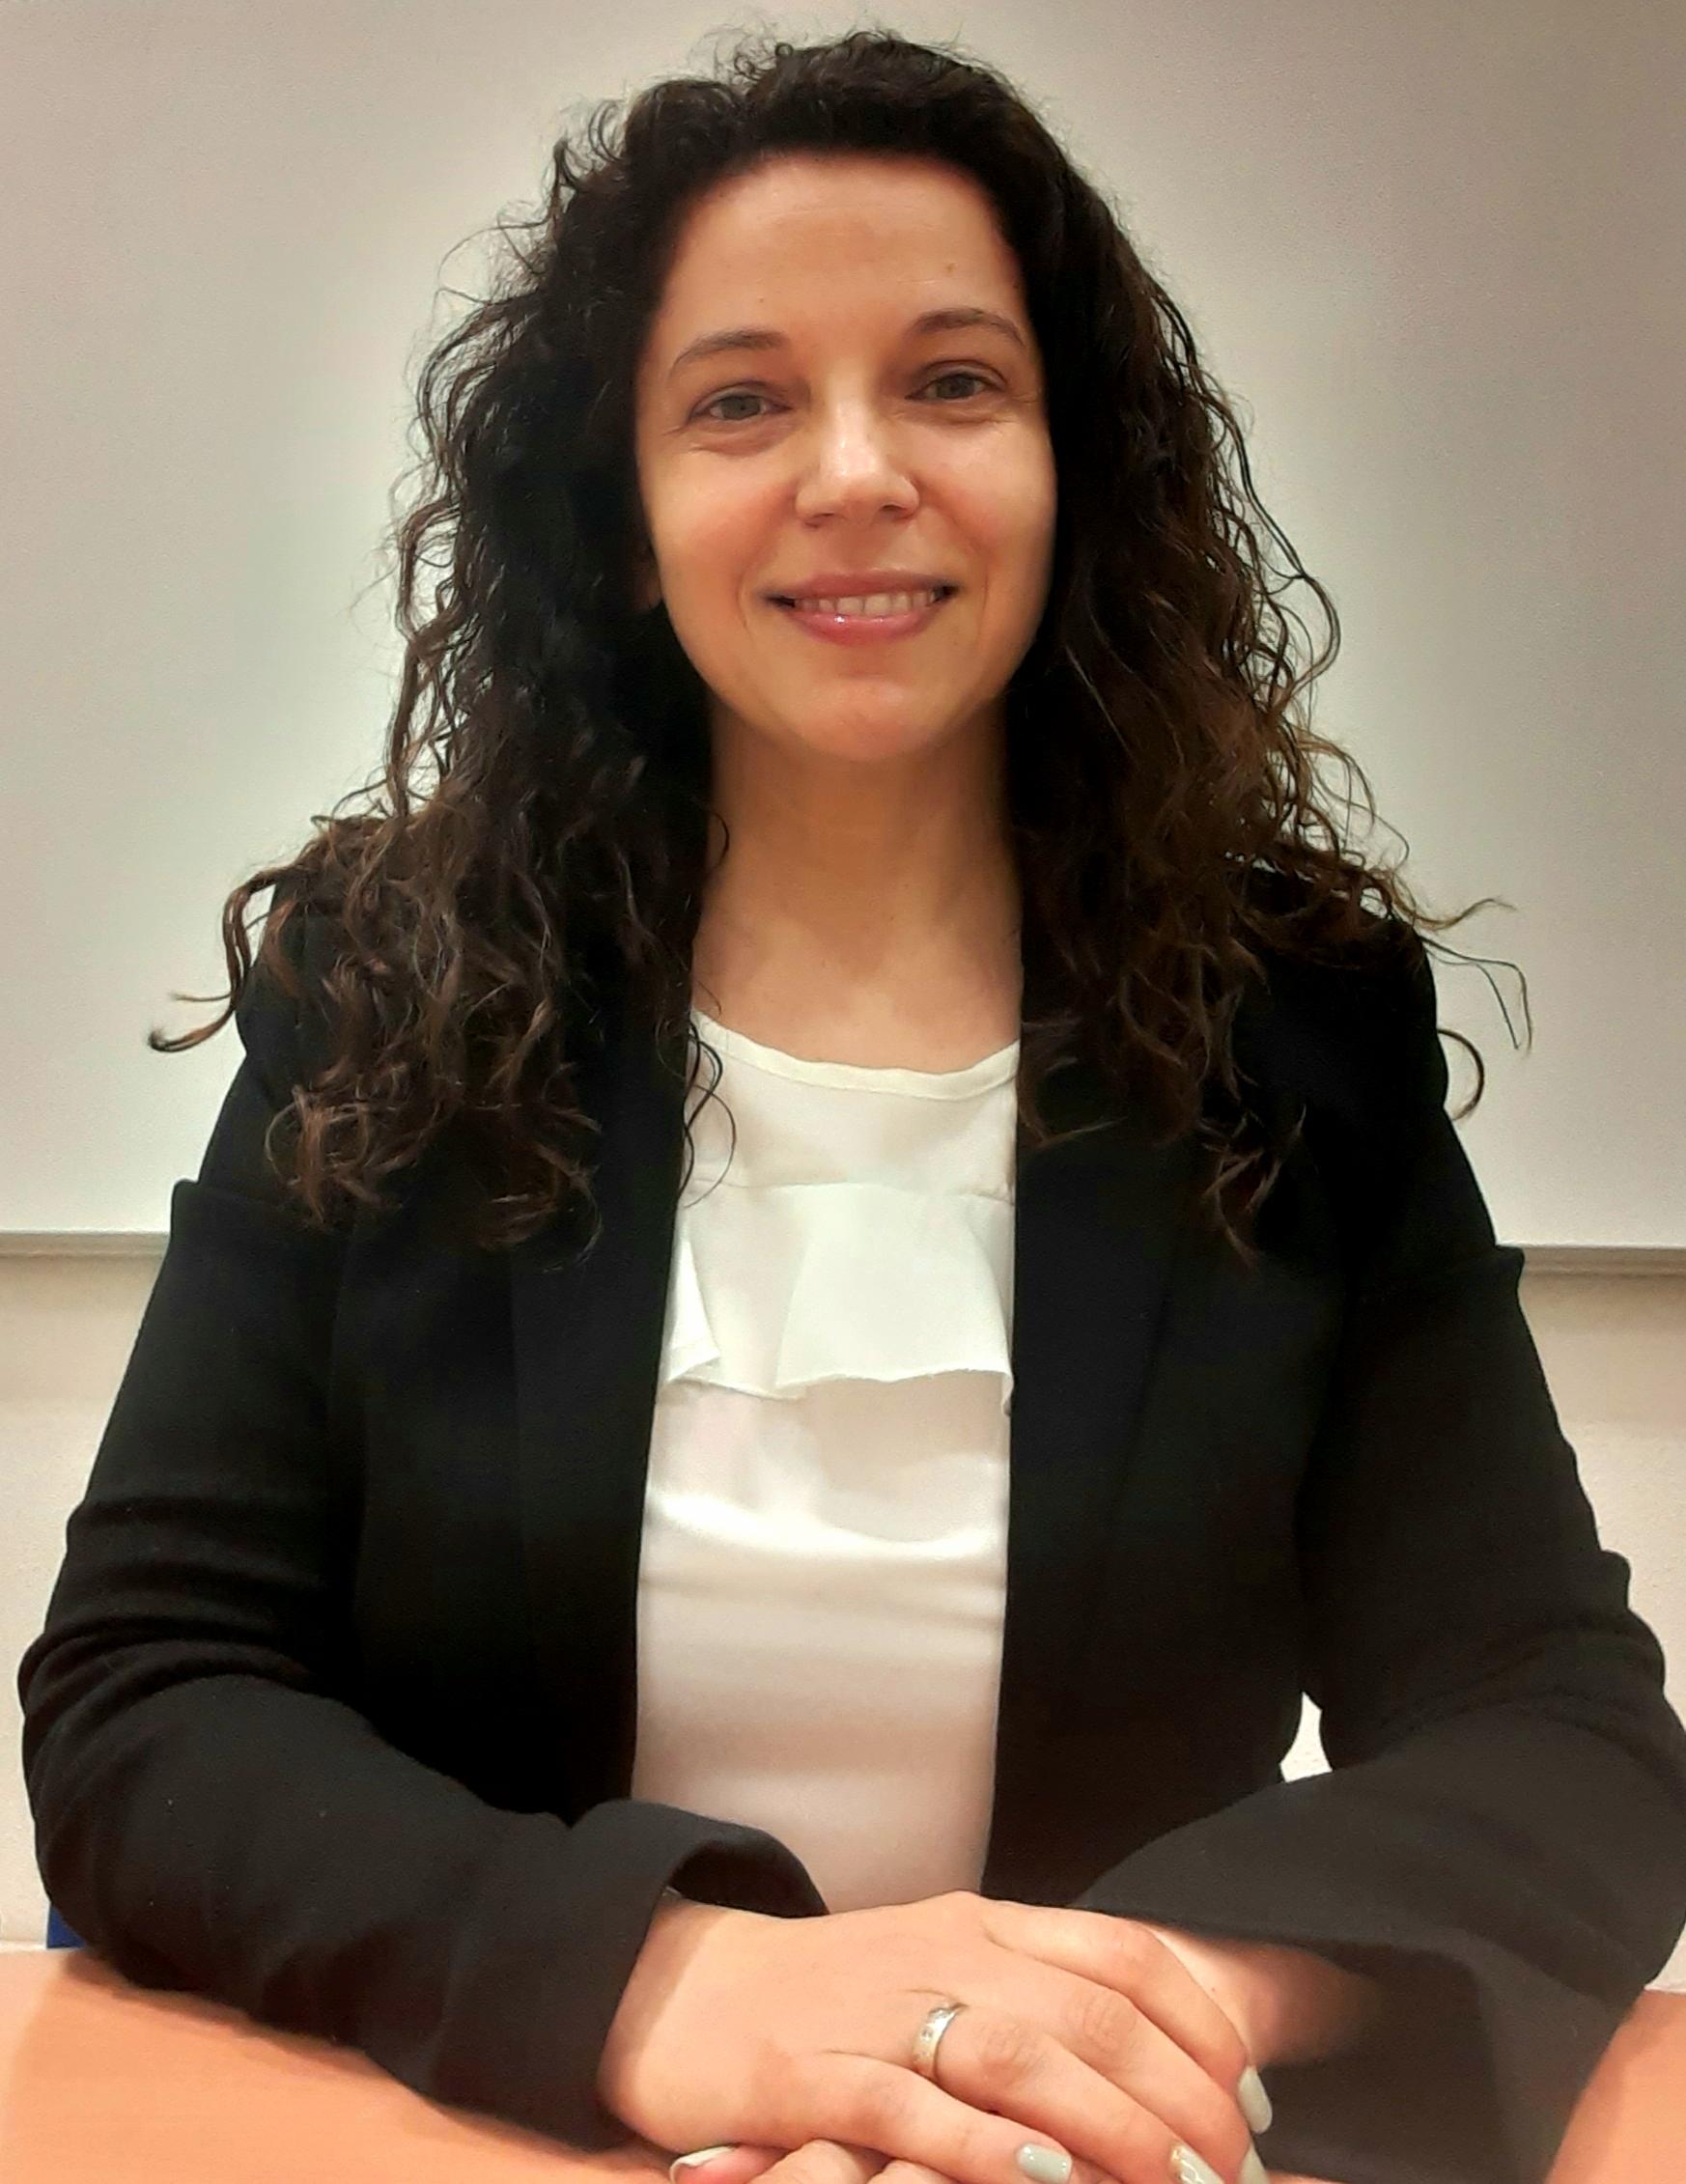 Susana Isabel Caetano Domingos